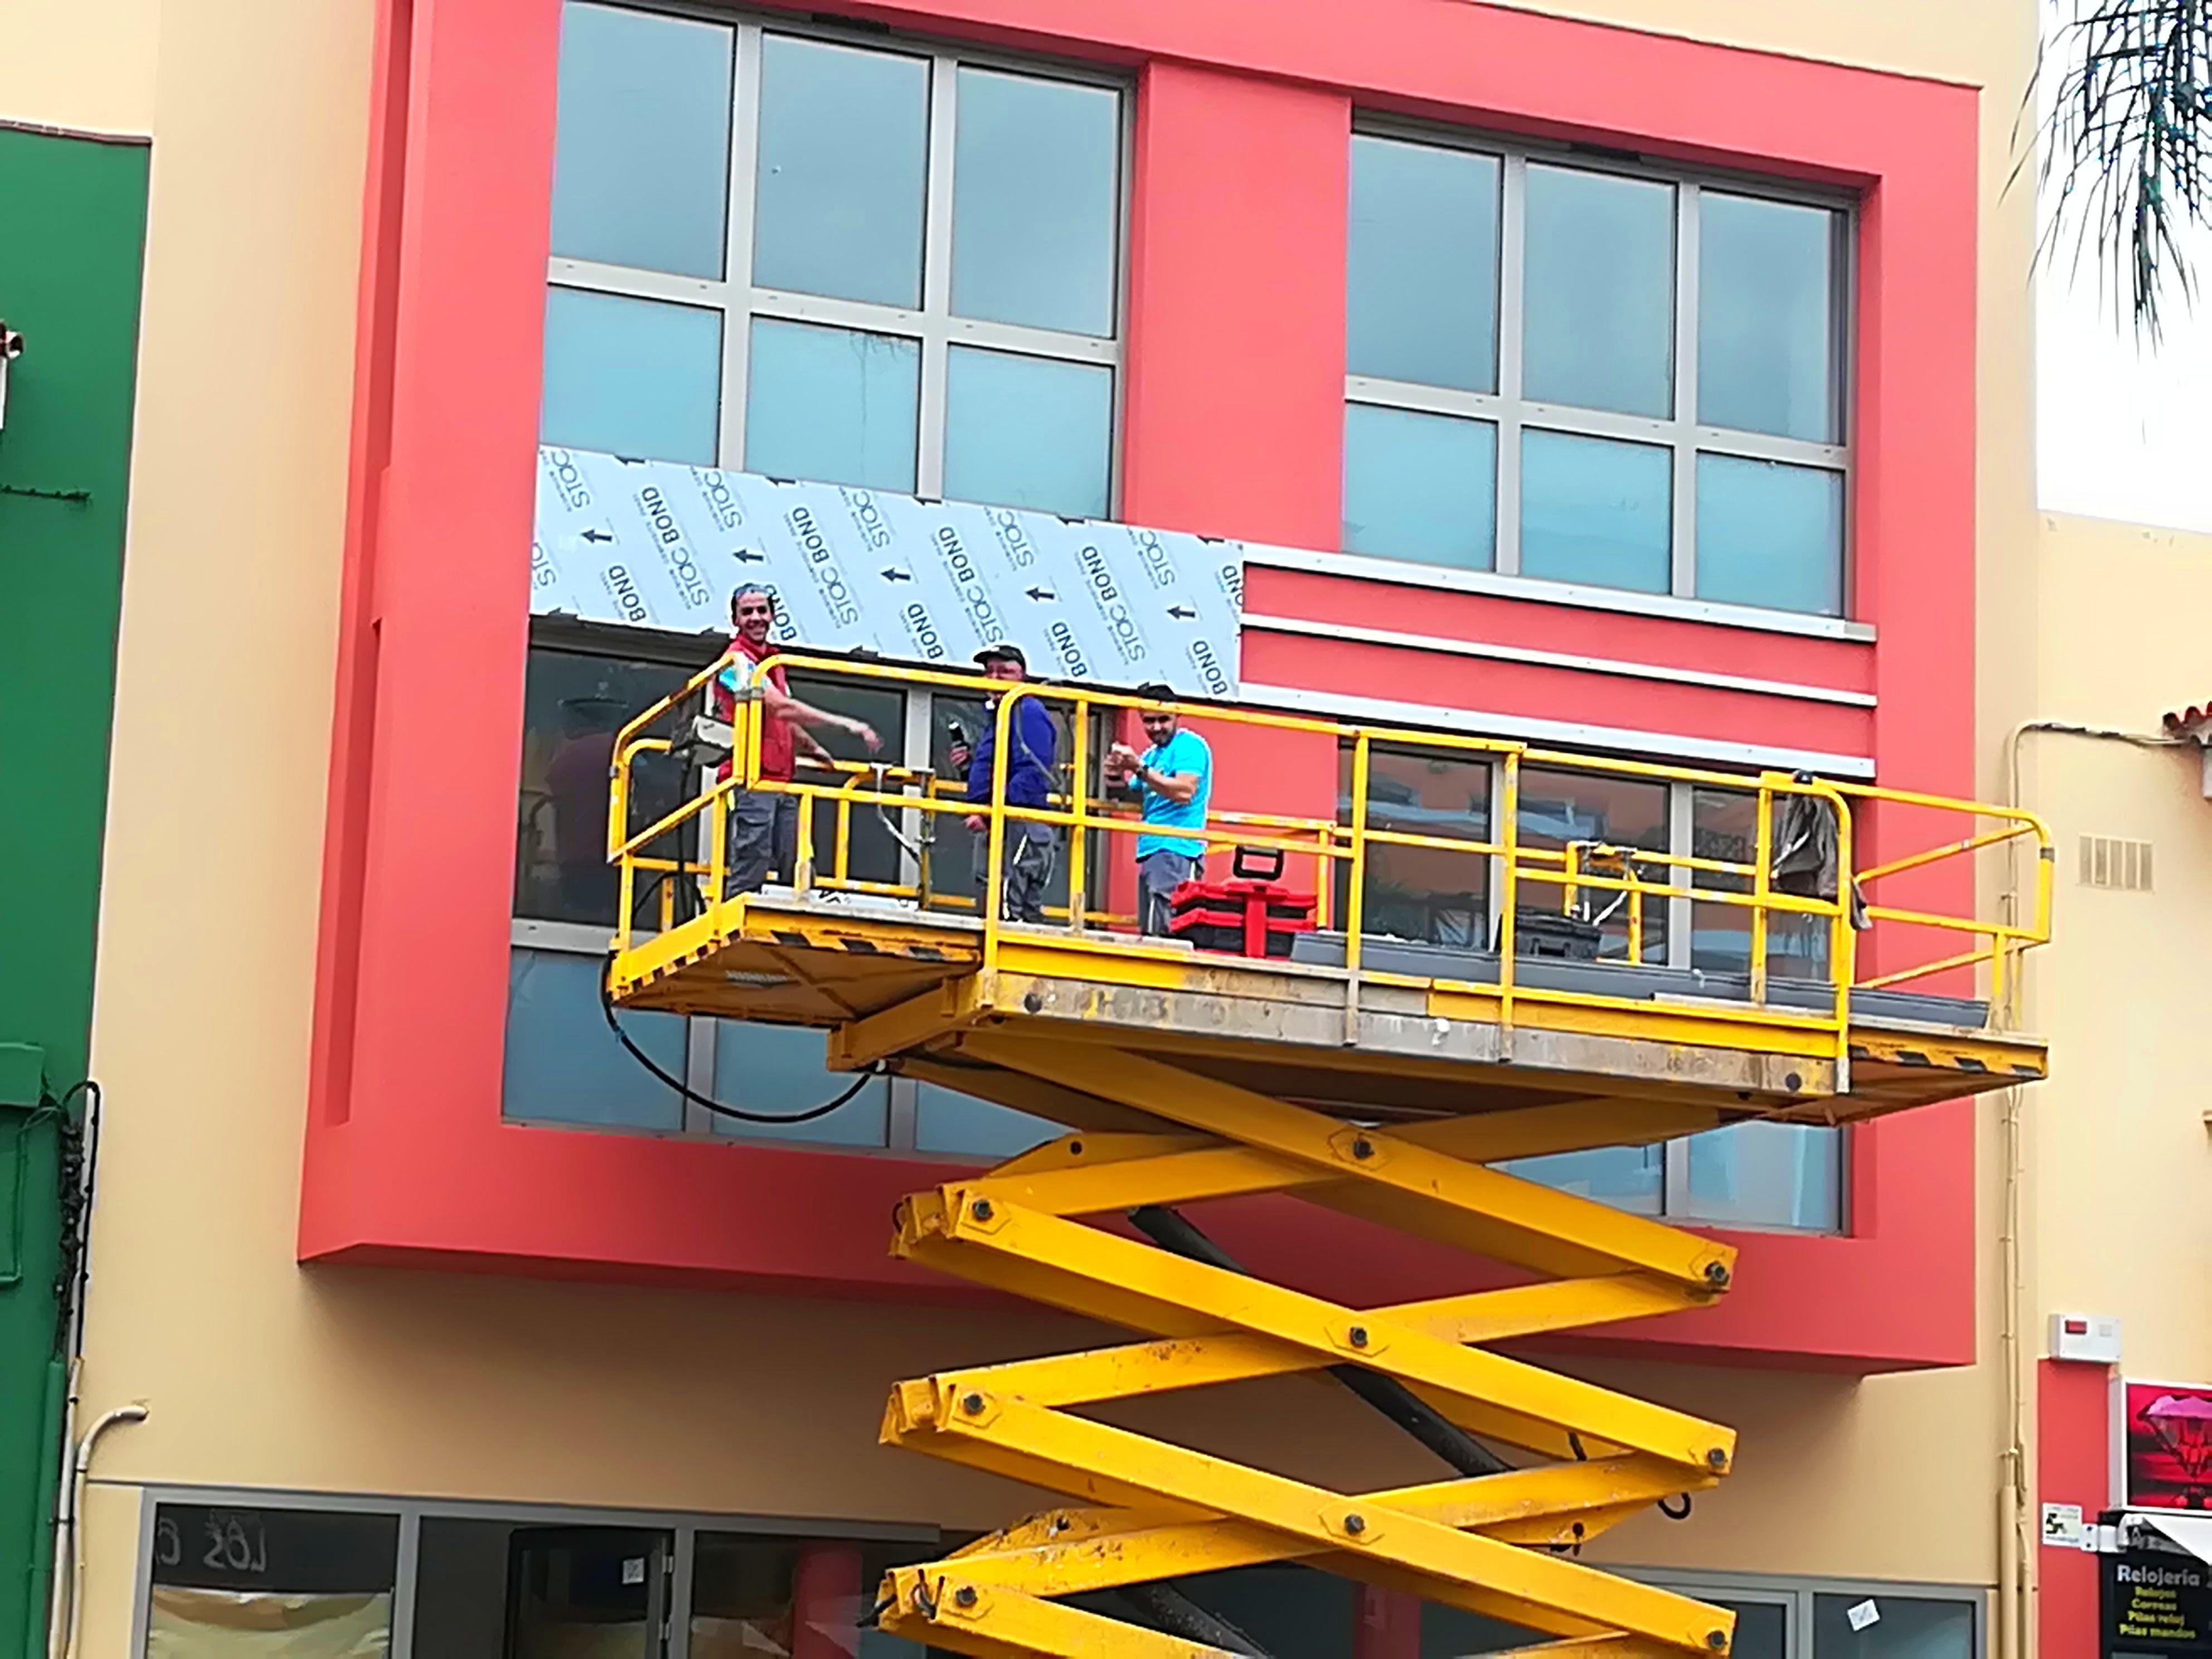 Fachada con ventanas en aluminio COR.60, ahora colocando  Stacbon